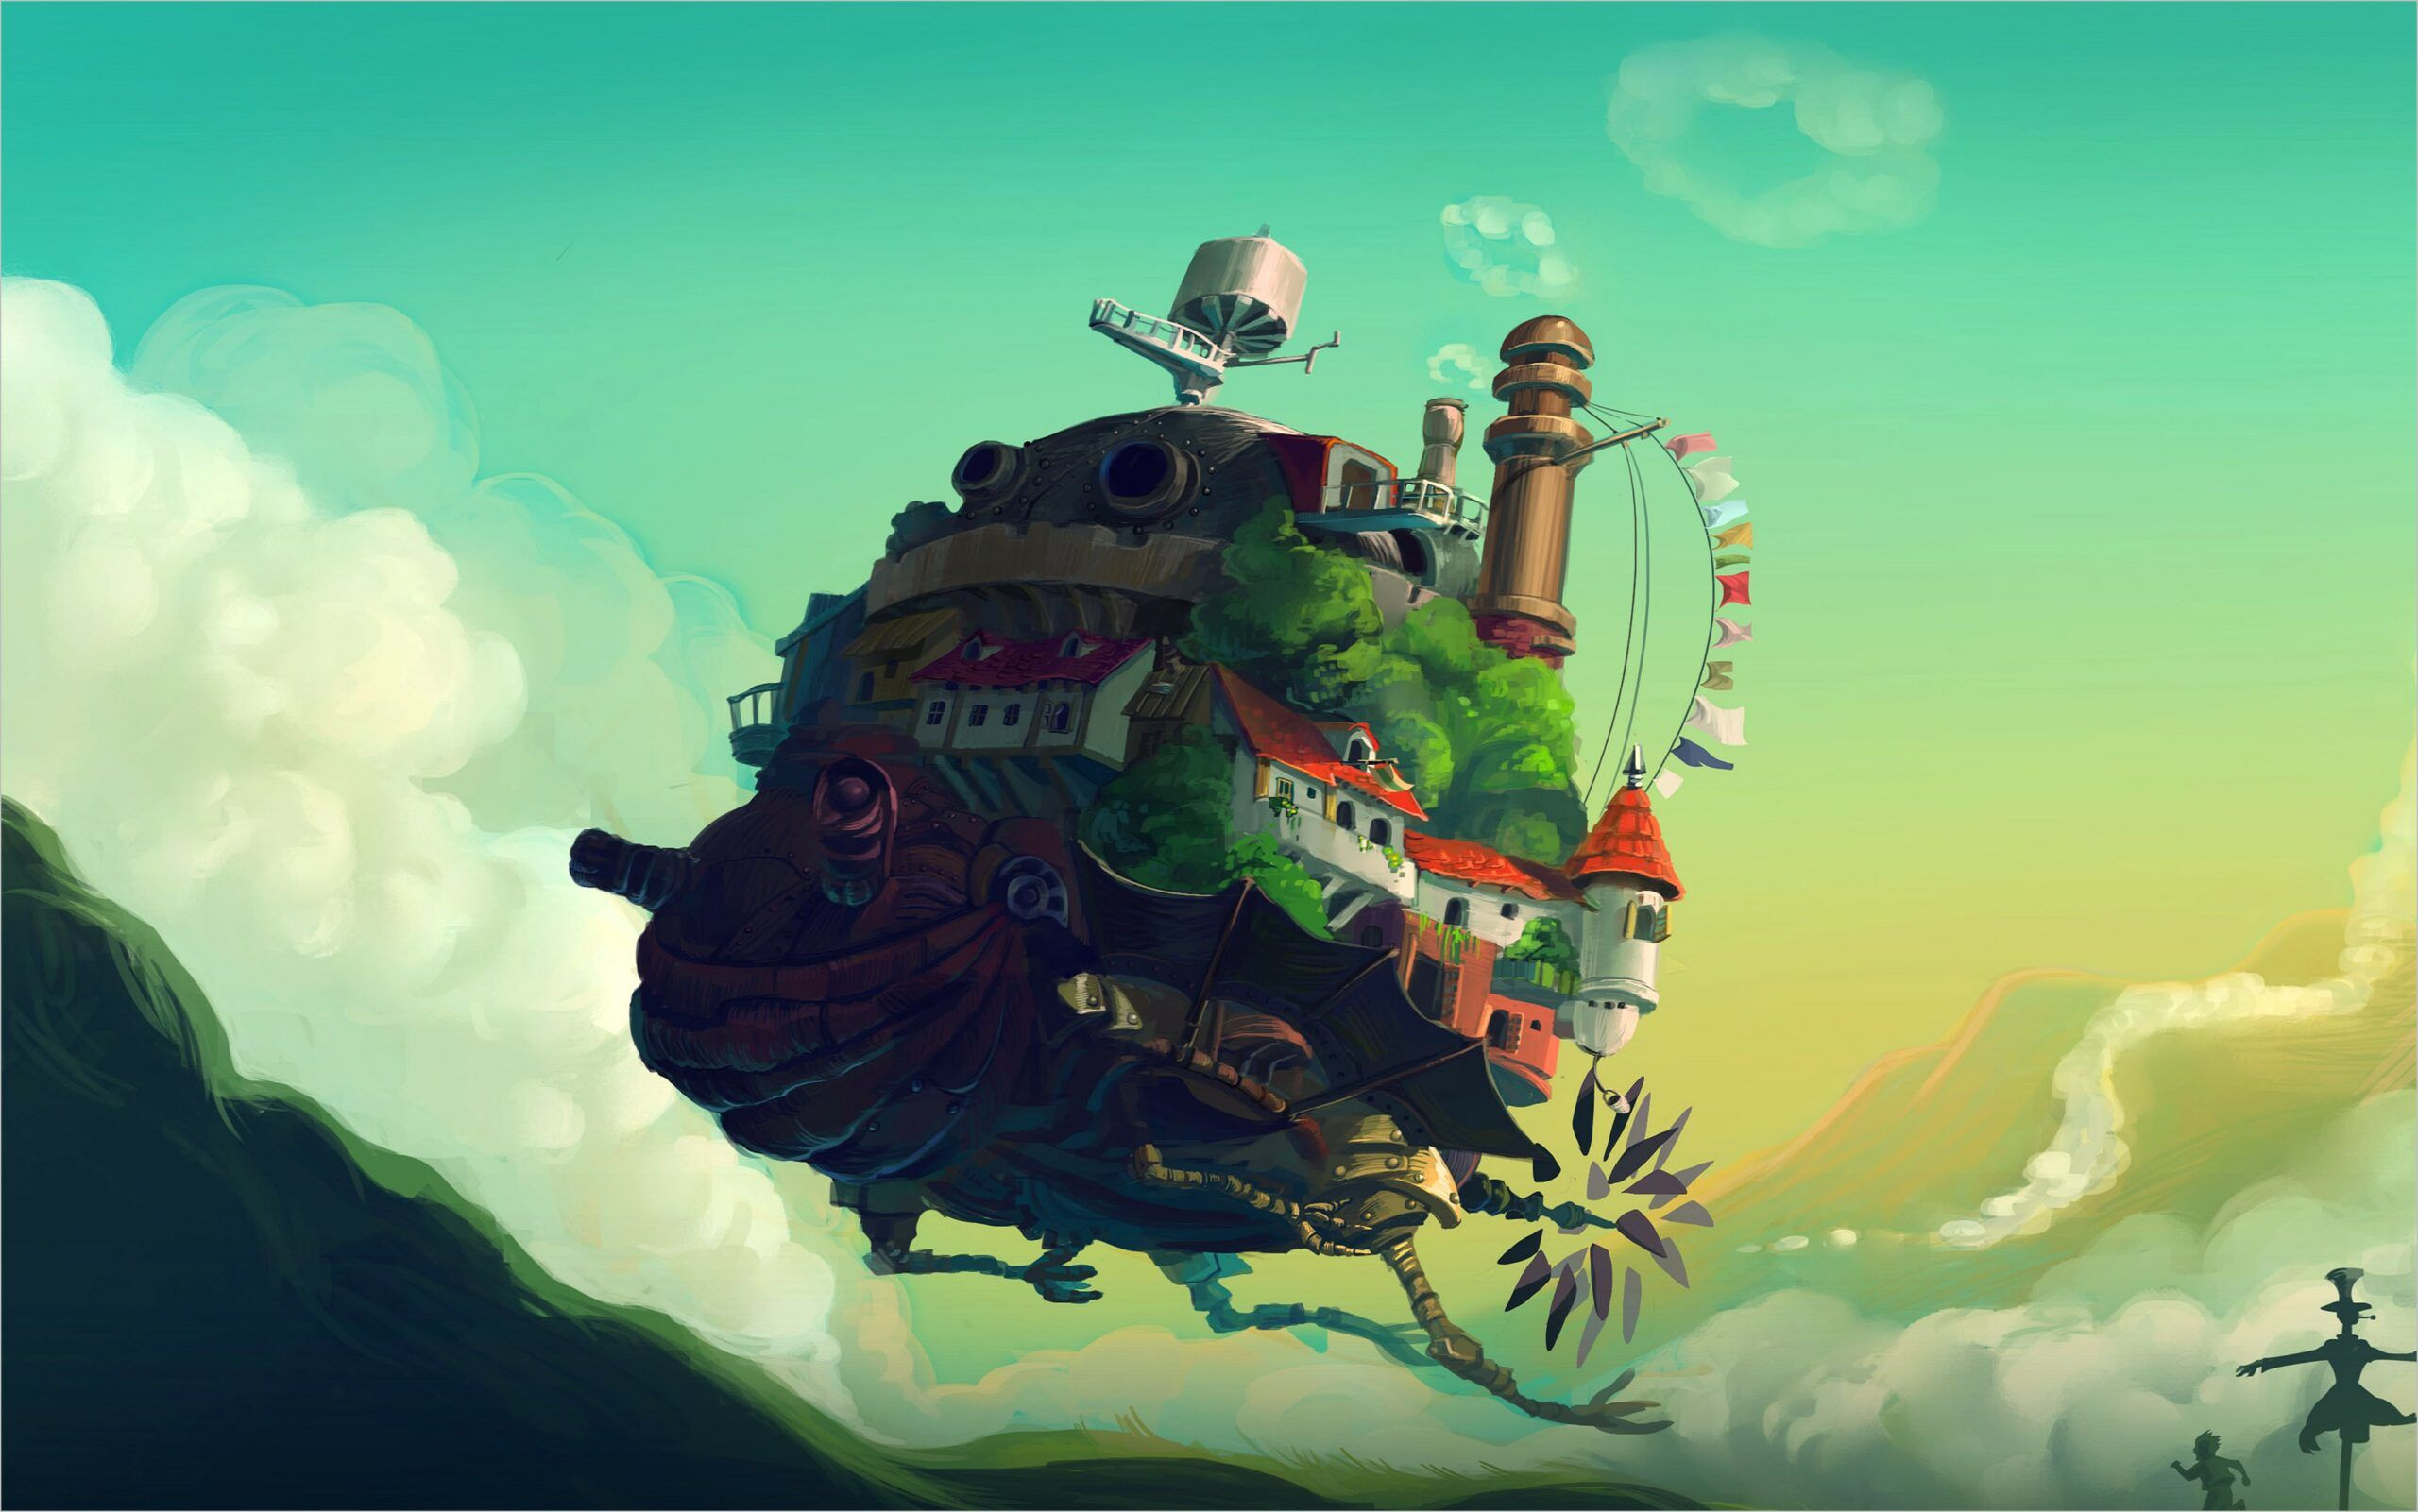 Studio Ghibli Wallpaper 4k In 2020 Howls Moving Castle Wallpaper Chill Wallpaper Howls Moving Castle